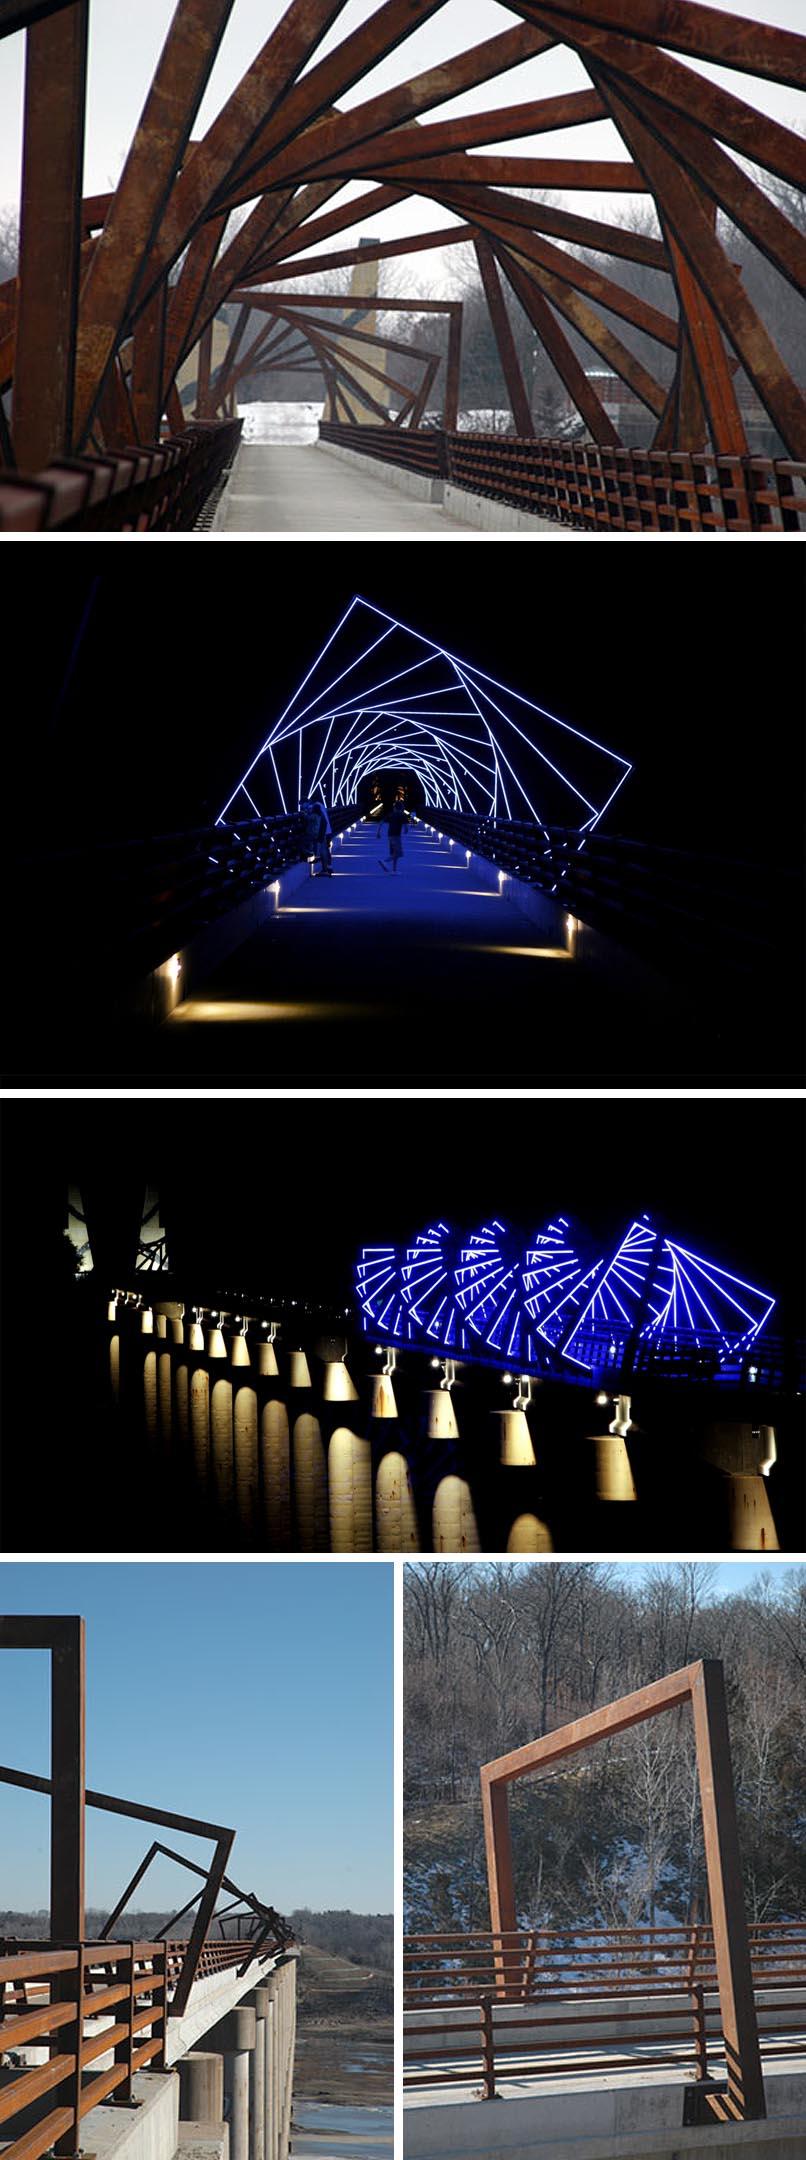 High Trestle Trail Bridge by RDG Dahlquist Art Studio